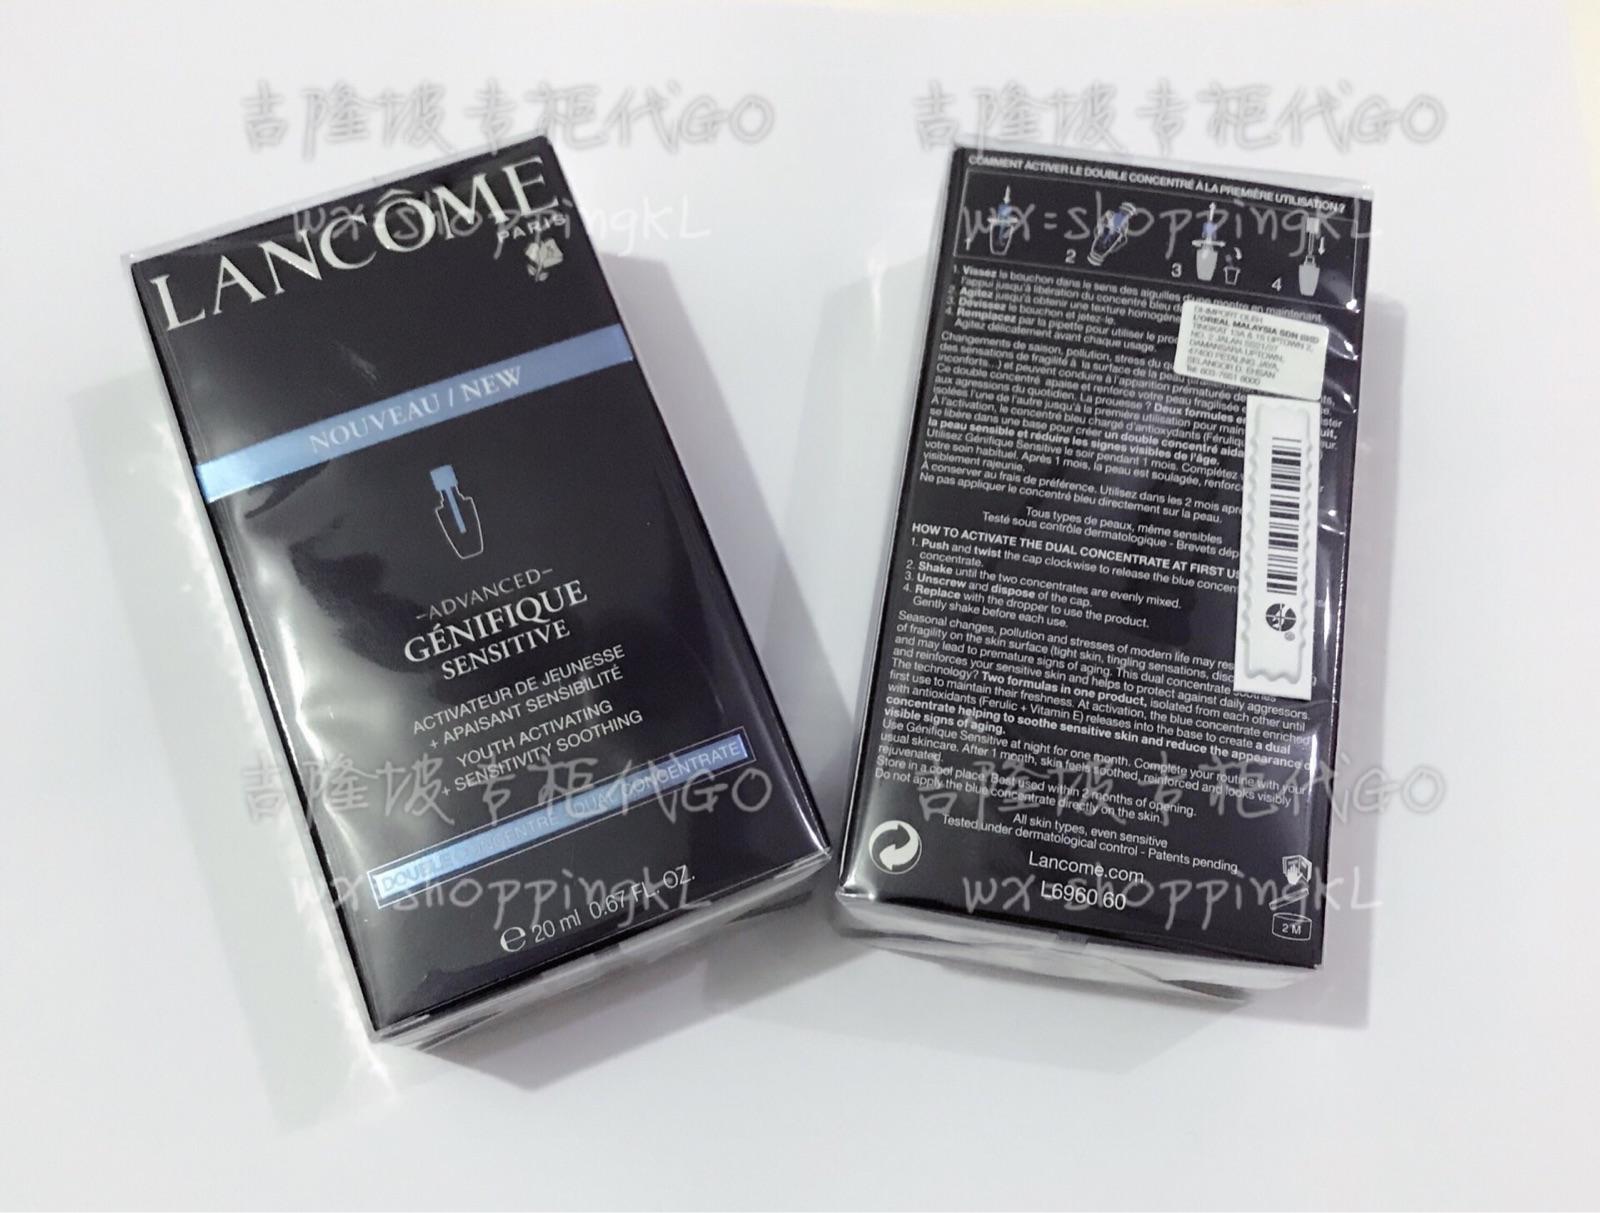 Lancome兰蔻新款小黑瓶安瓶精华 肌底修护舒润精华液20ml 现货